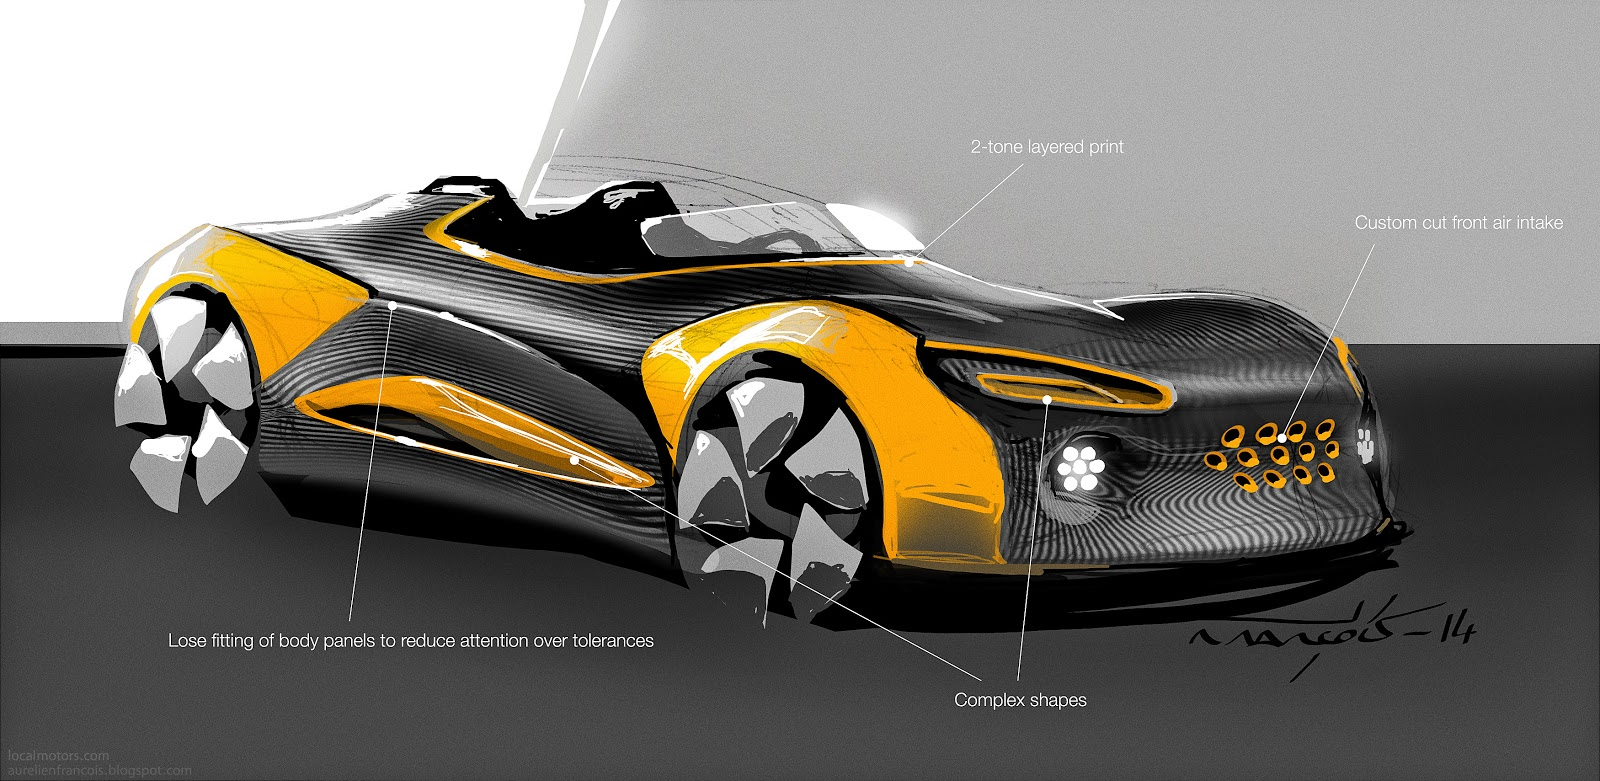 Designs by Aurel: 3D Printed Car?